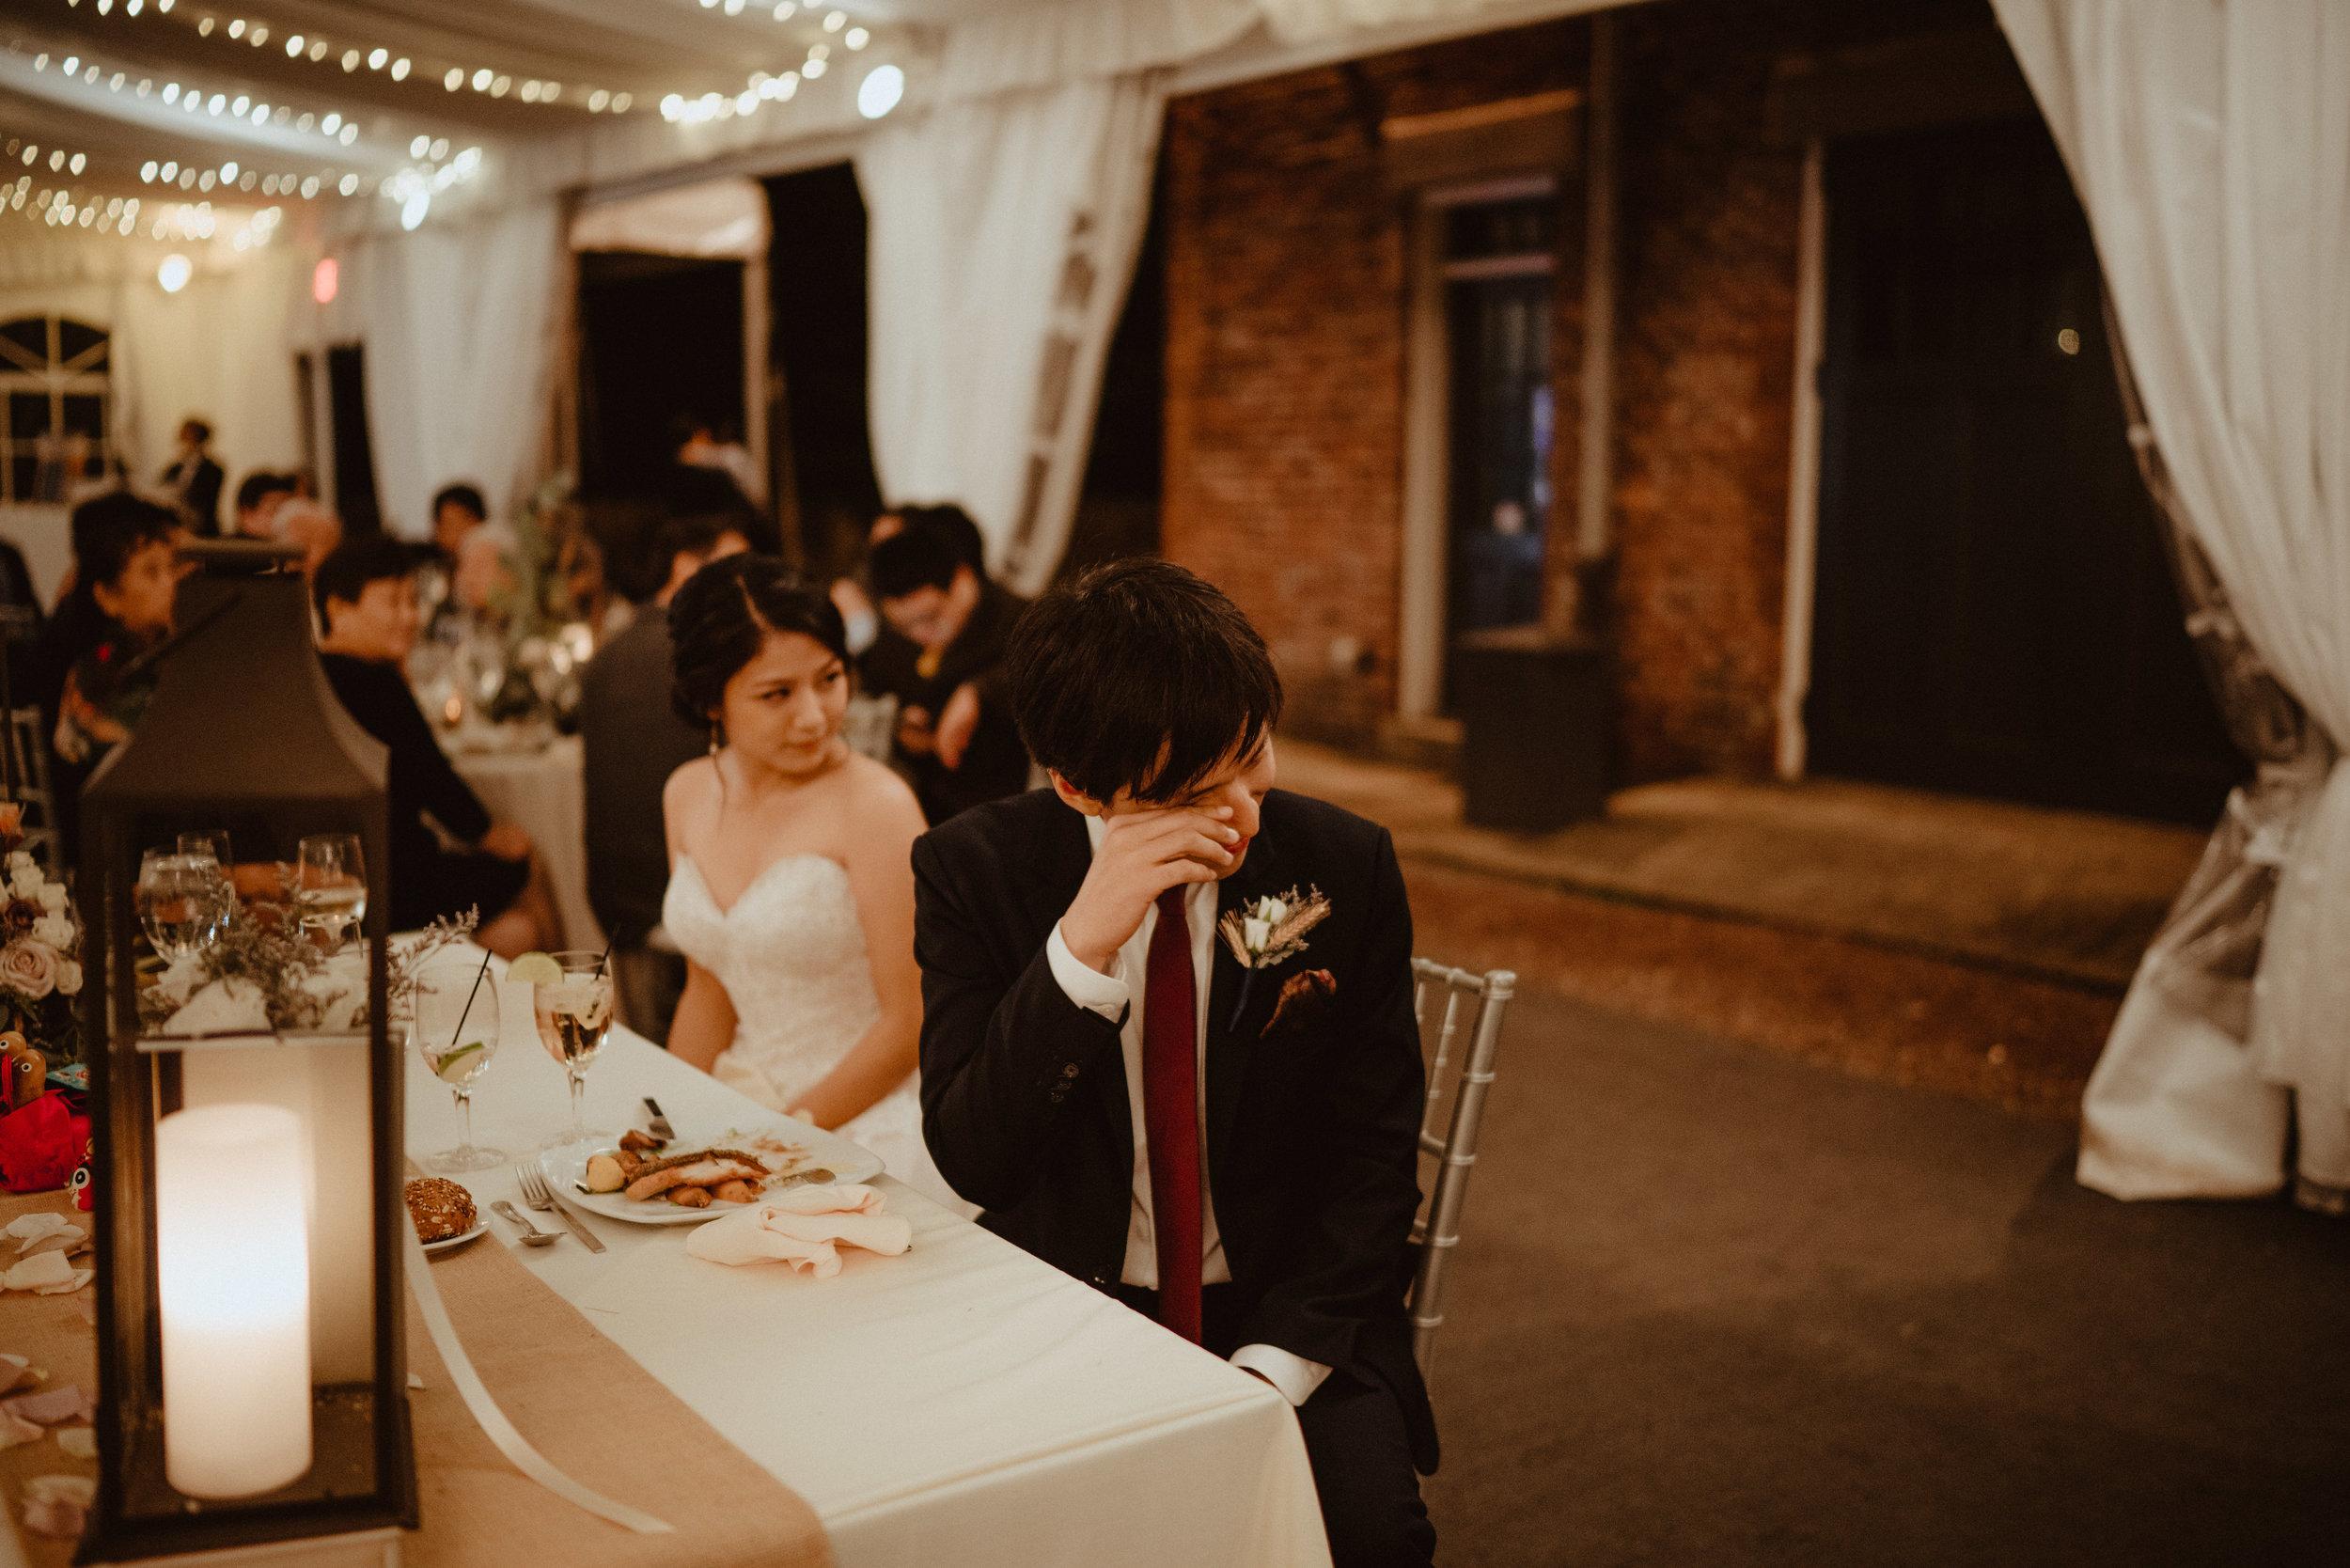 Irene-and-Jae-2019_Brooklyn_Wedding_Photographer_Chellise_Michael_Photography--127.jpg